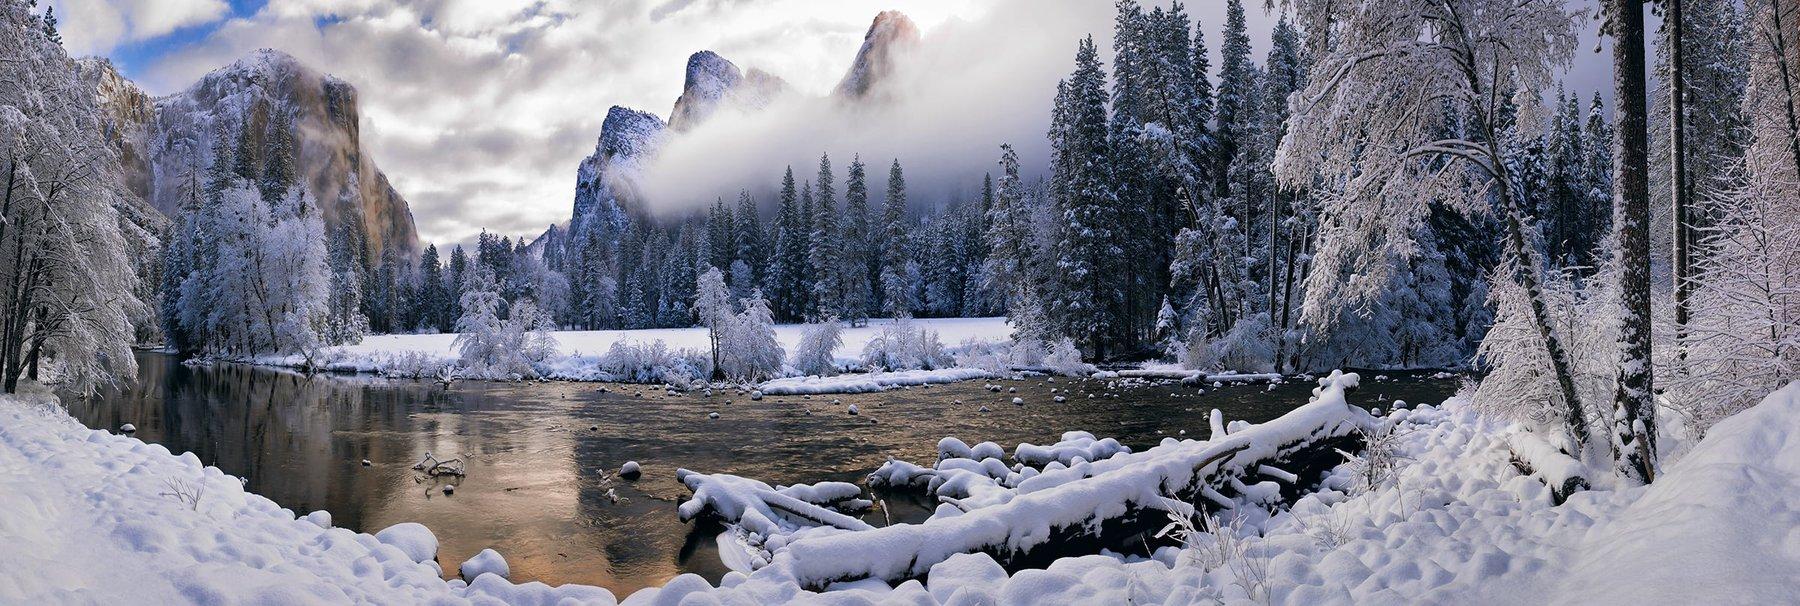 Peter Lik - Mystic Valley